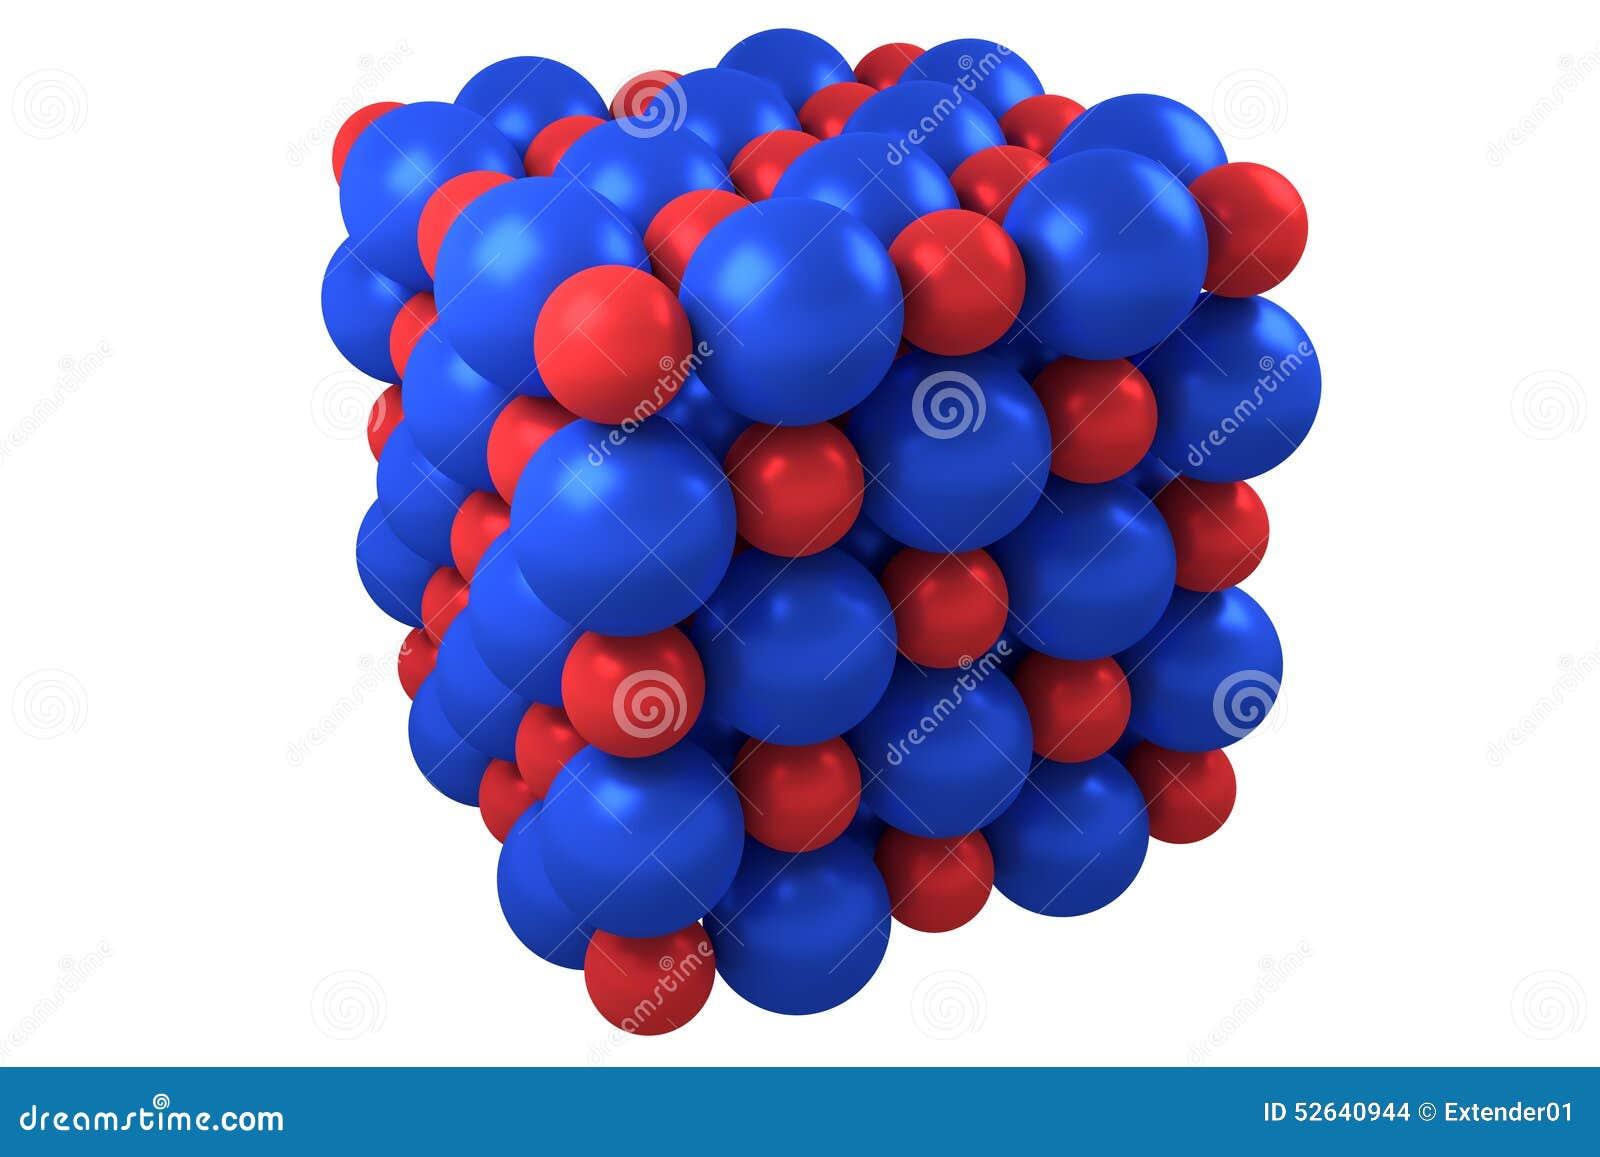 Kubikkristallstruktur Des Moleküls Stock Abbildung